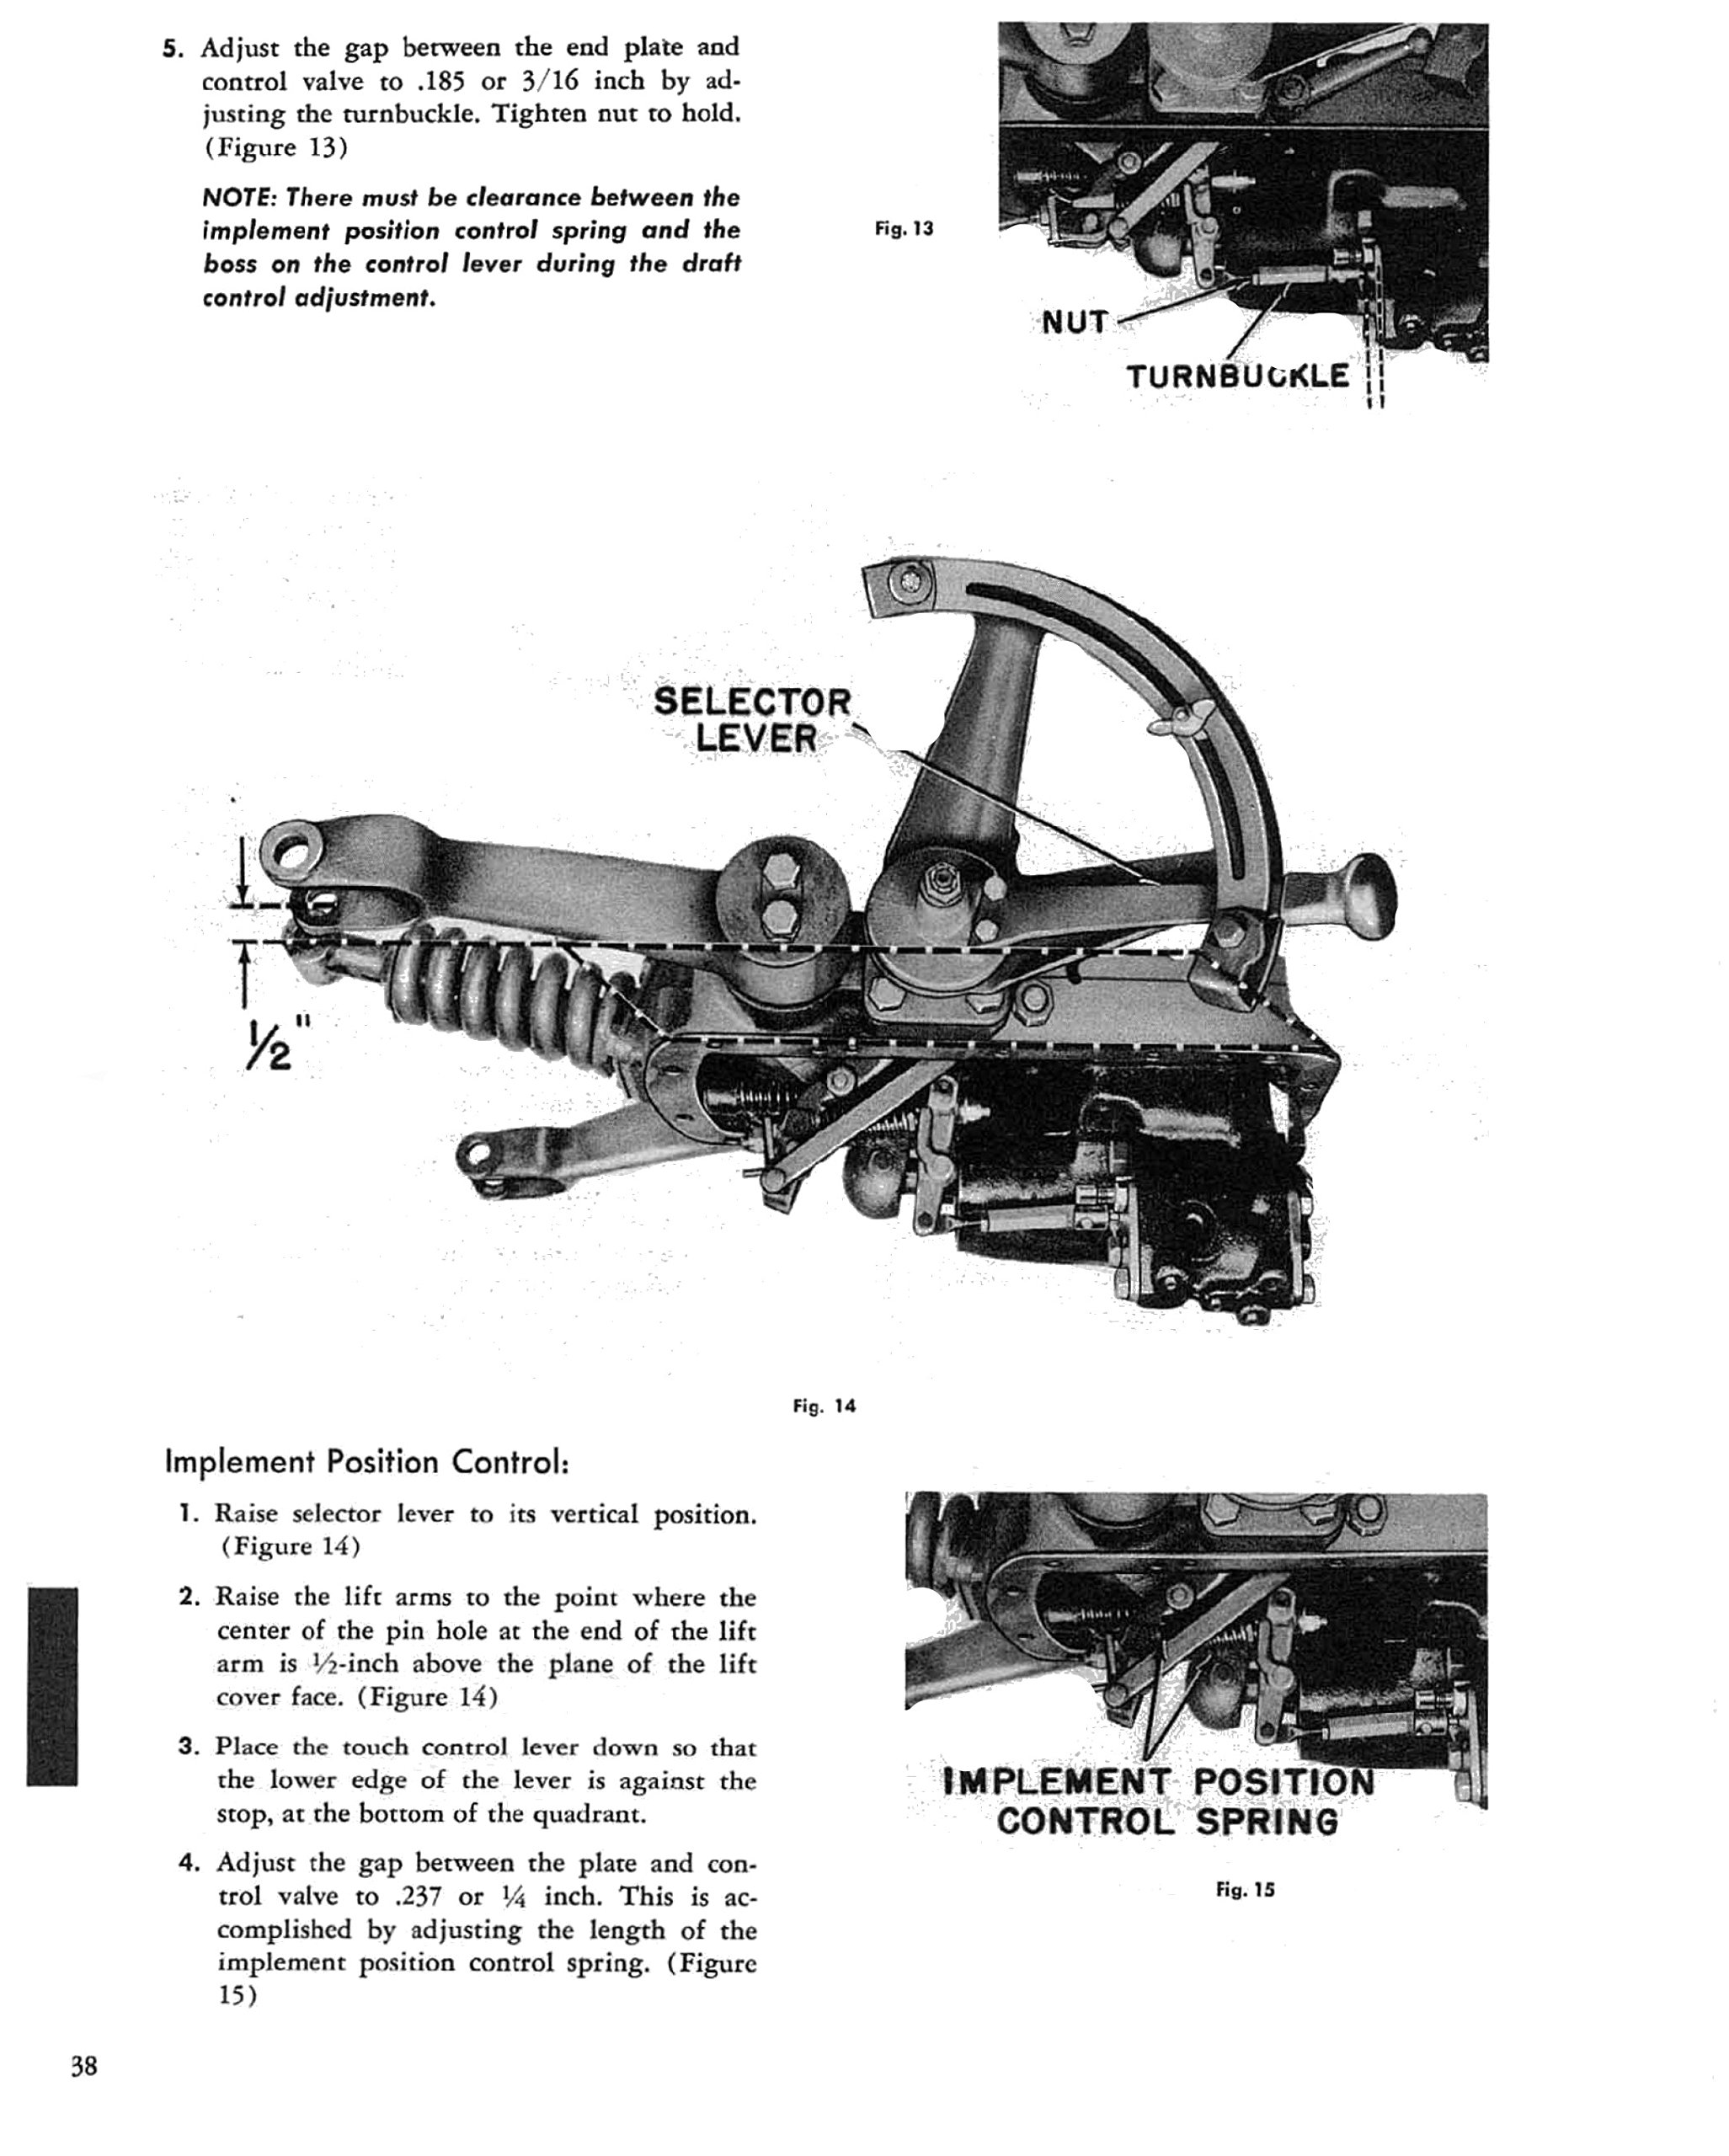 Enhanced 1953-53 Ford Tractor NAA Service Shop Manual: A1TractorManuals,  FORD - original manual: 0763616420272: Amazon.com: Books